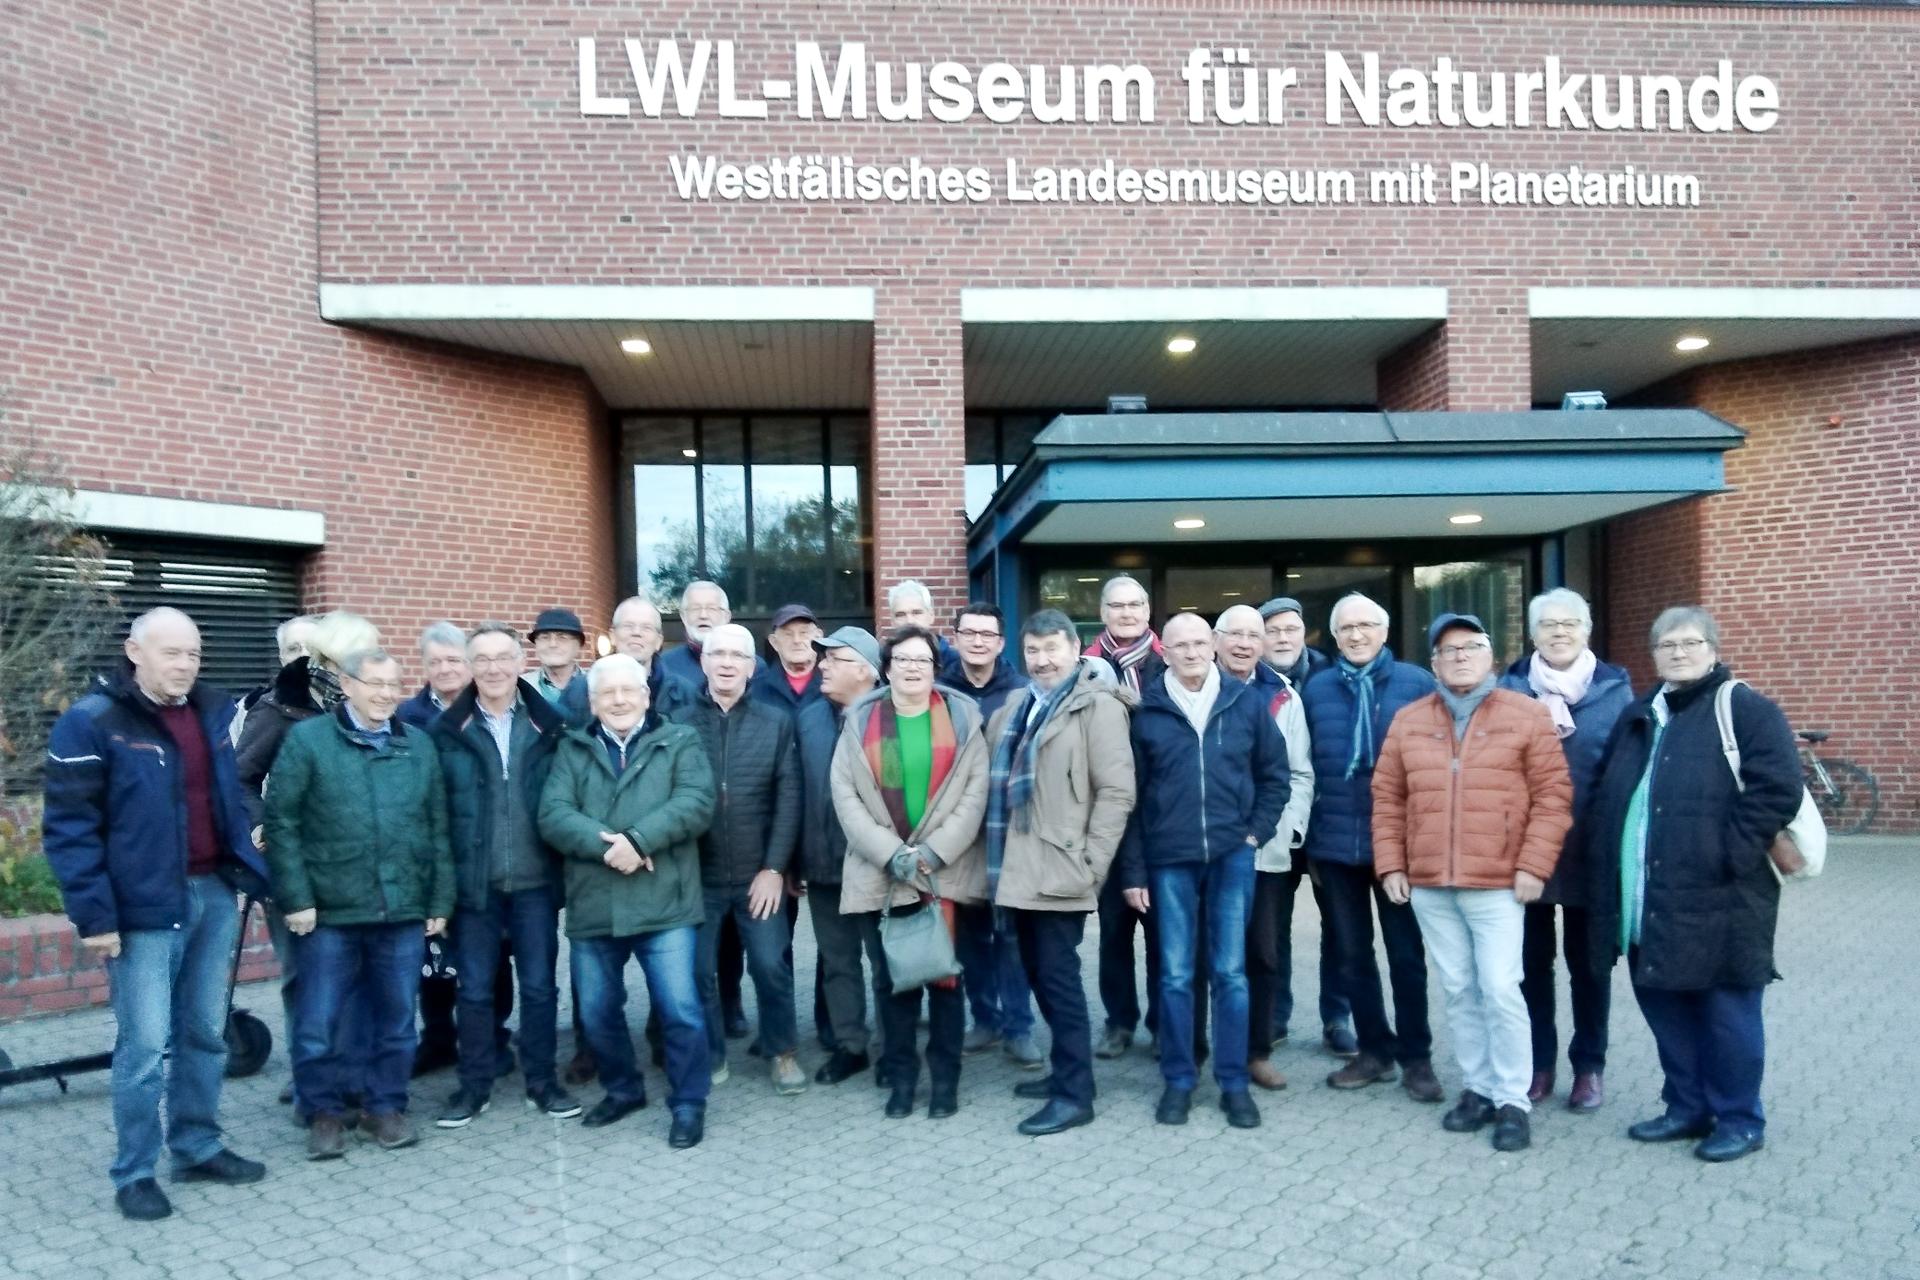 LWL-Museum